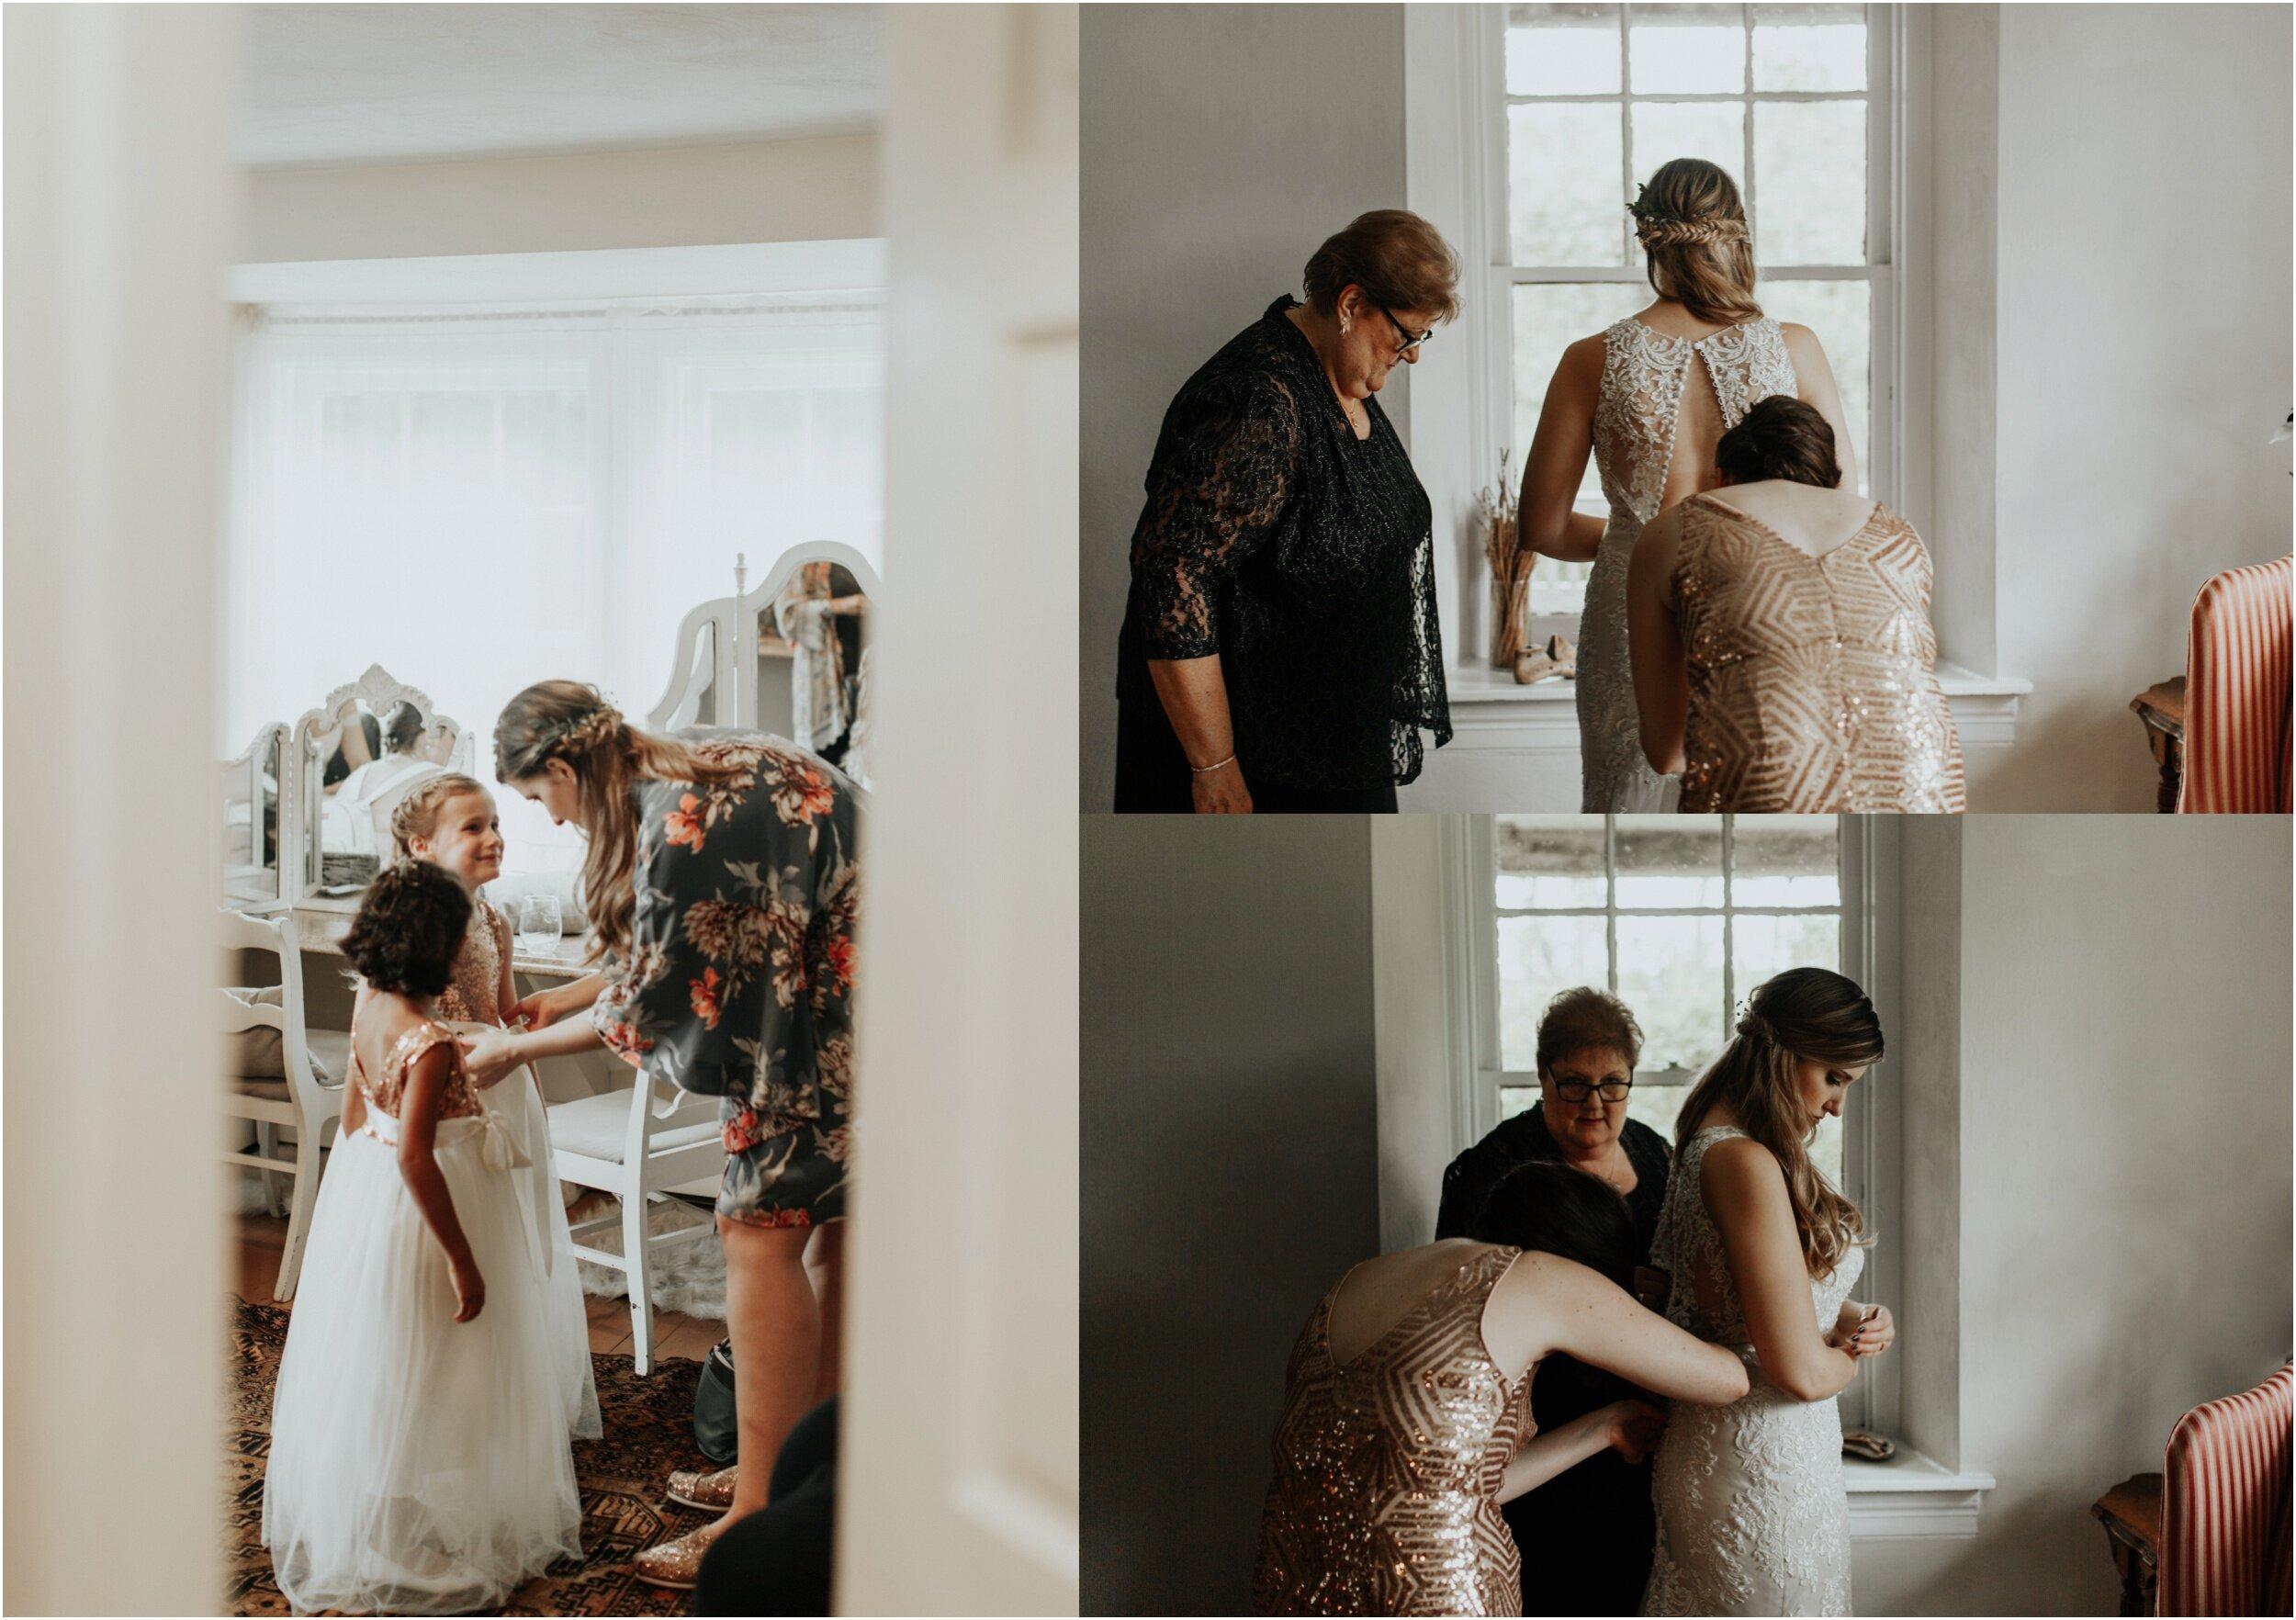 steph-and-jordan-cox-our-wedding-historic-shady-lane-compass-wedding-collective-hazel-lining-photography-destination-elopement-wedding-engagement-photography_0013.jpg